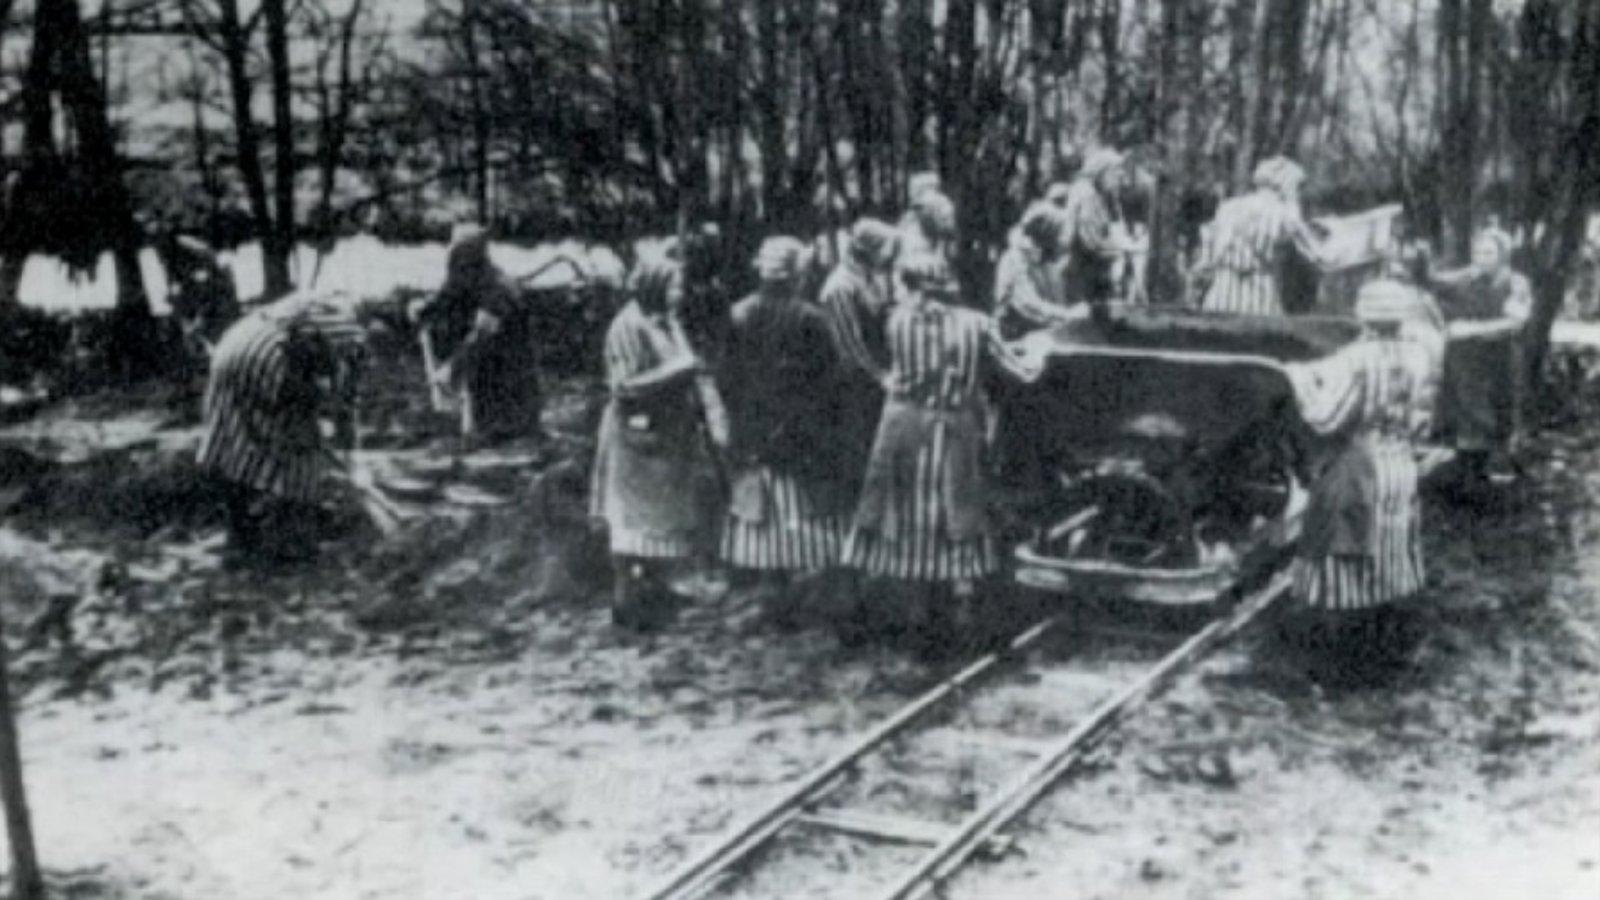 Where Birds Never Sang - The Ravensbrueck Concentration Camp